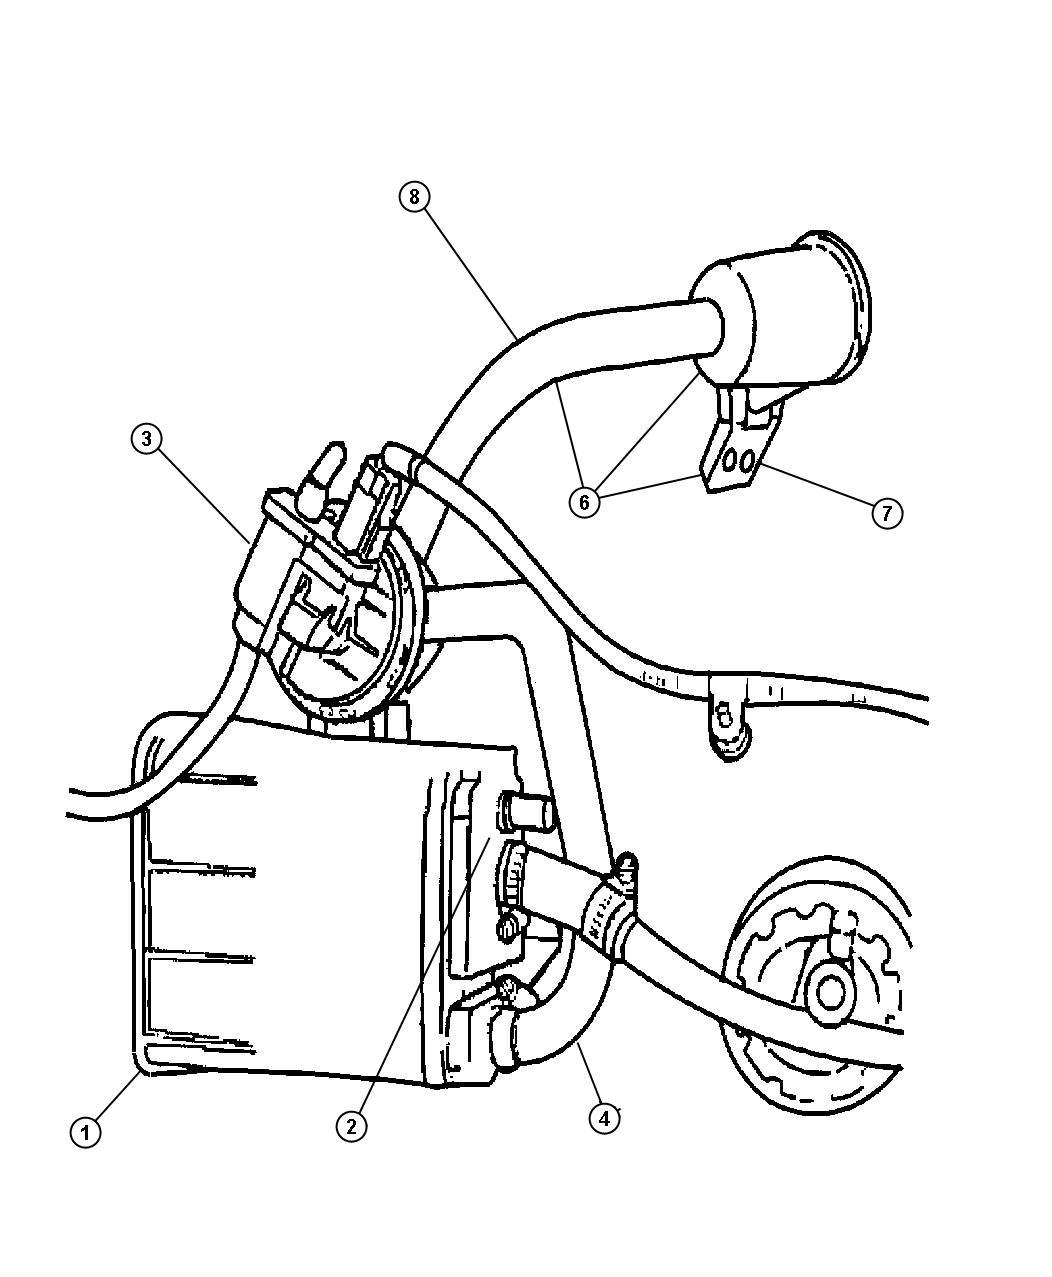 fuse box diagram on 2002 chrysler sebring dash light wiring diagram